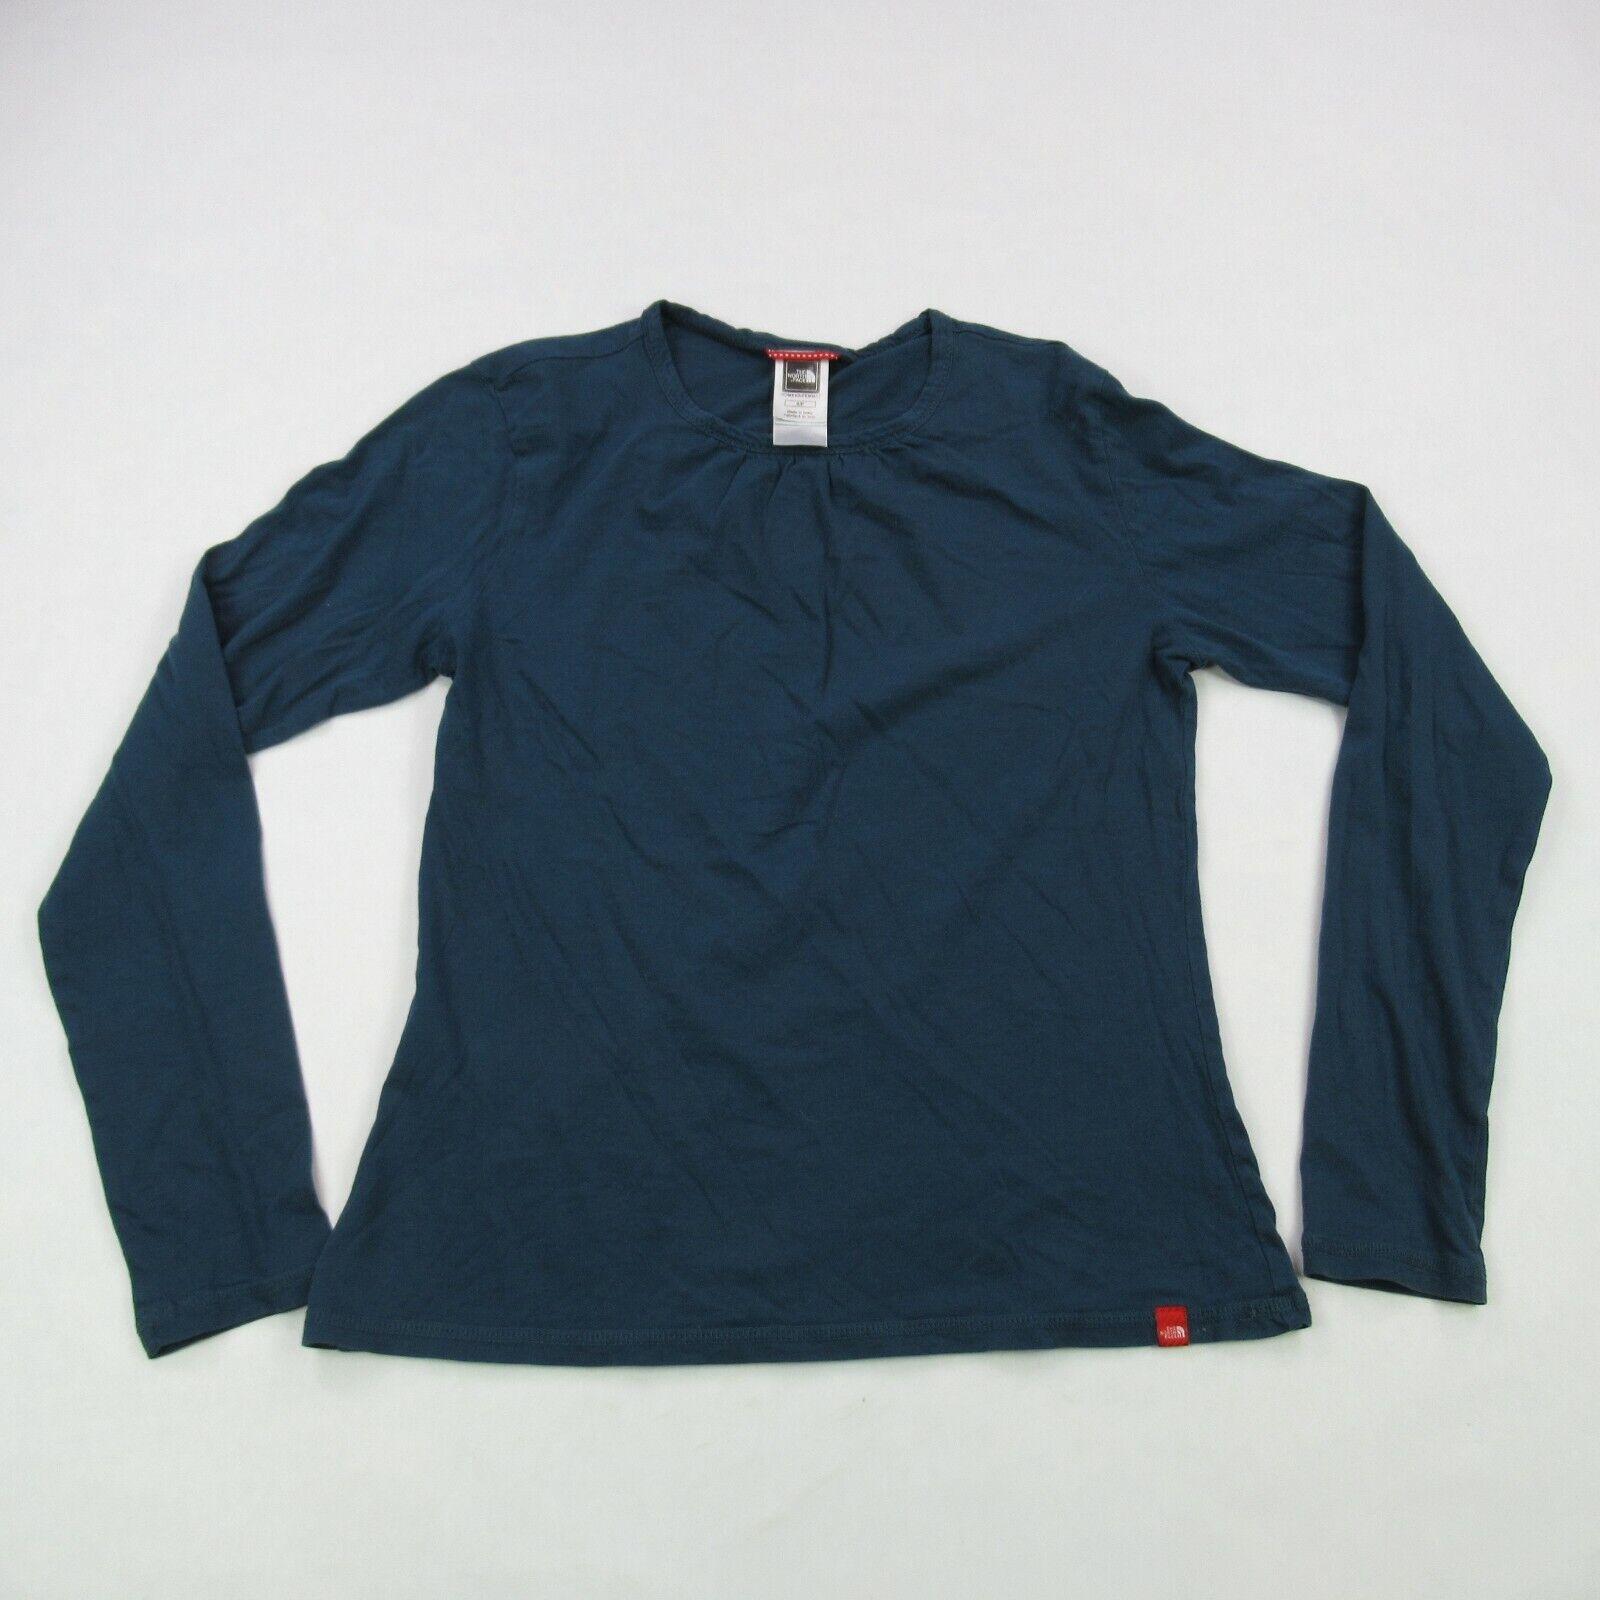 North Face Shirt Womens Small Blue Long Sleeve Regular Fit Casual Lightweight